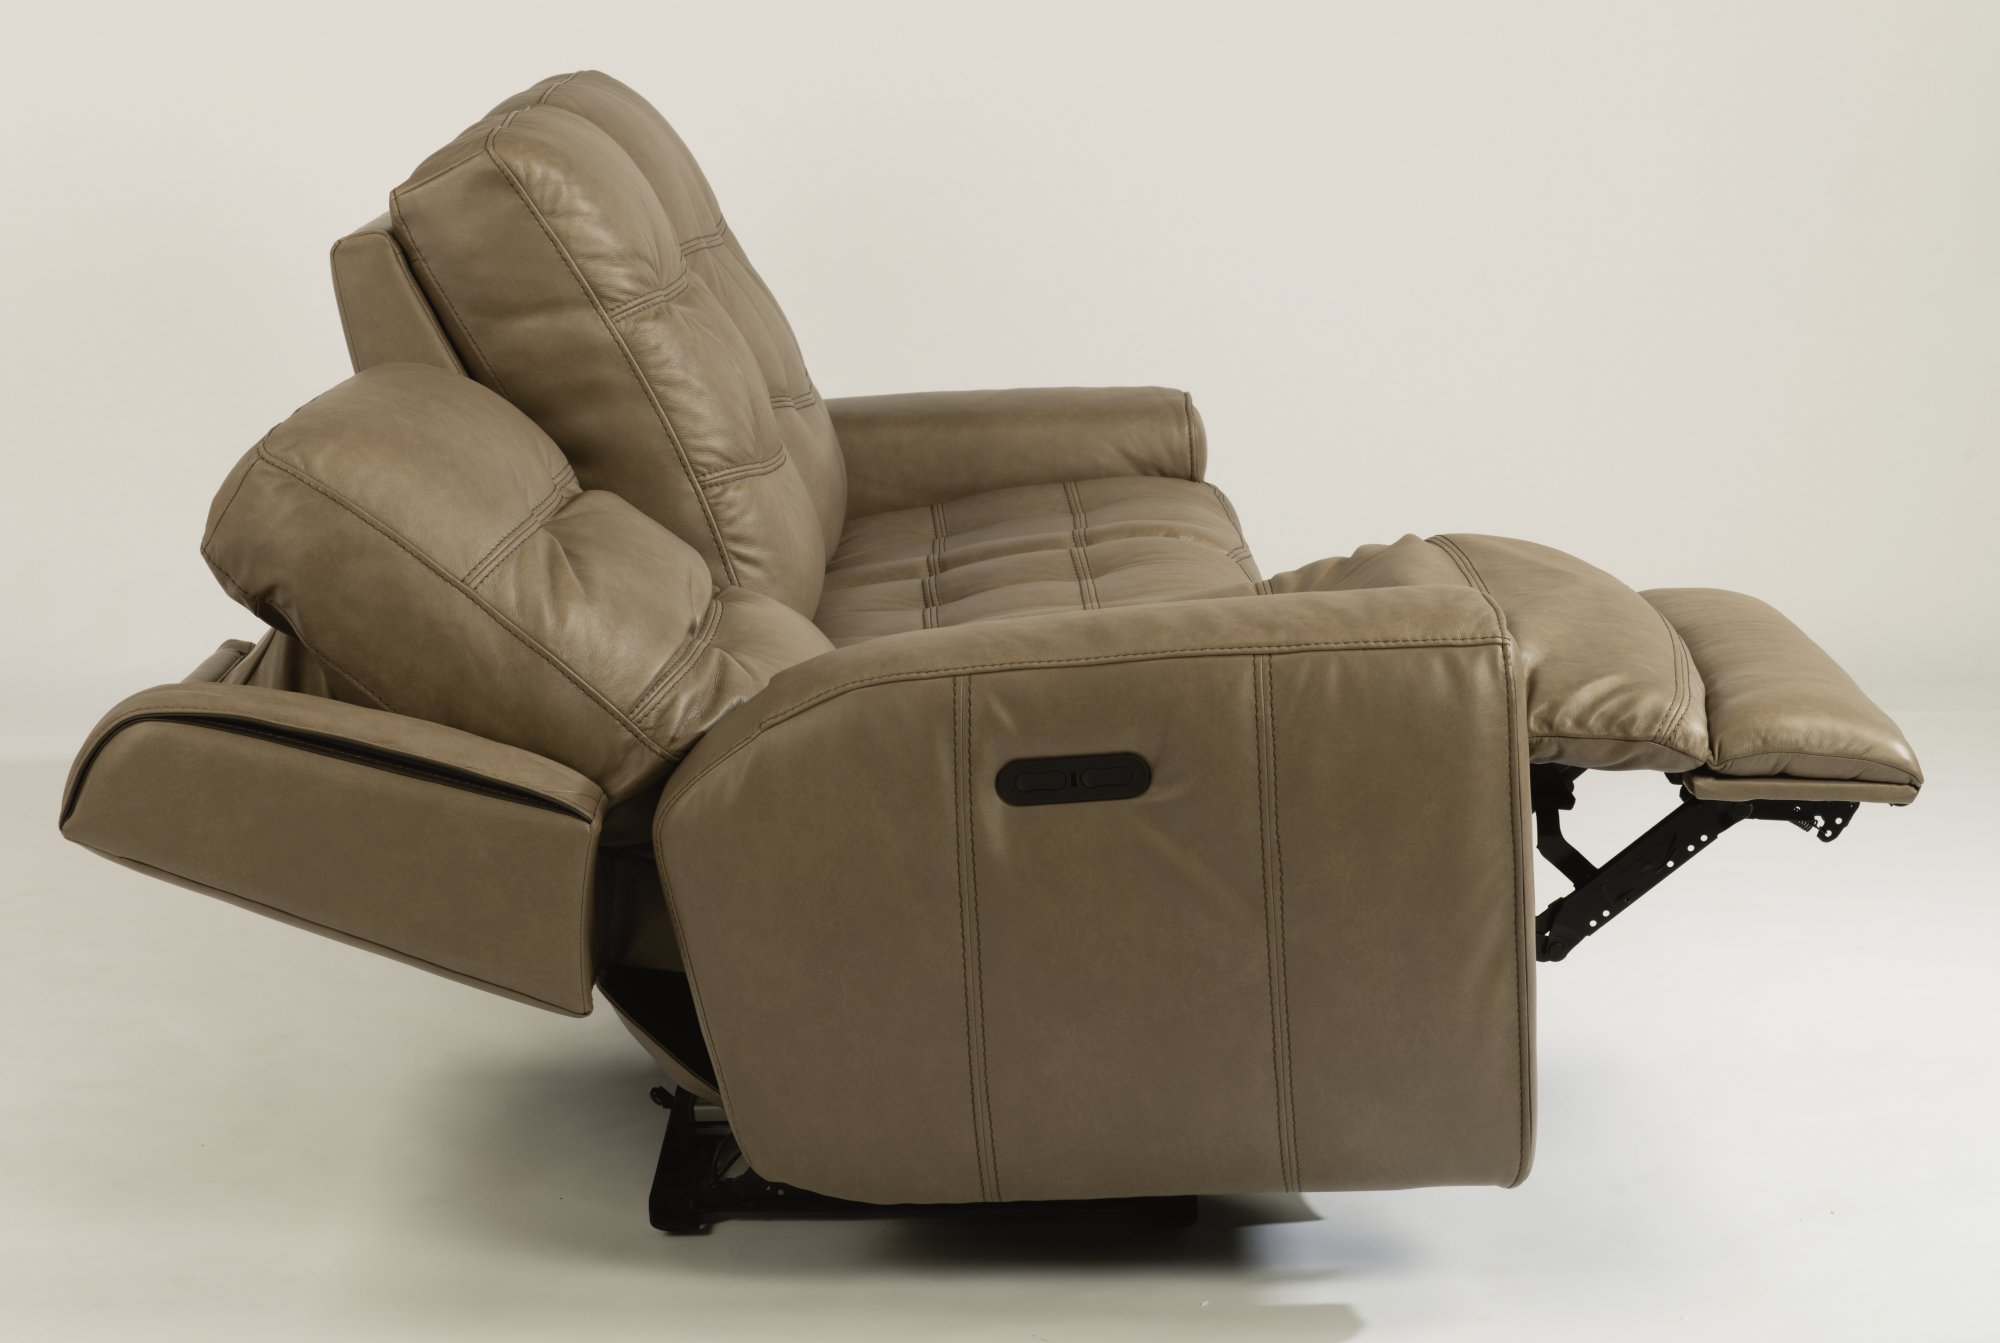 Stupendous Flexsteel 1681 62Ph Wicklow Leather Power Reclining Sofa Creativecarmelina Interior Chair Design Creativecarmelinacom